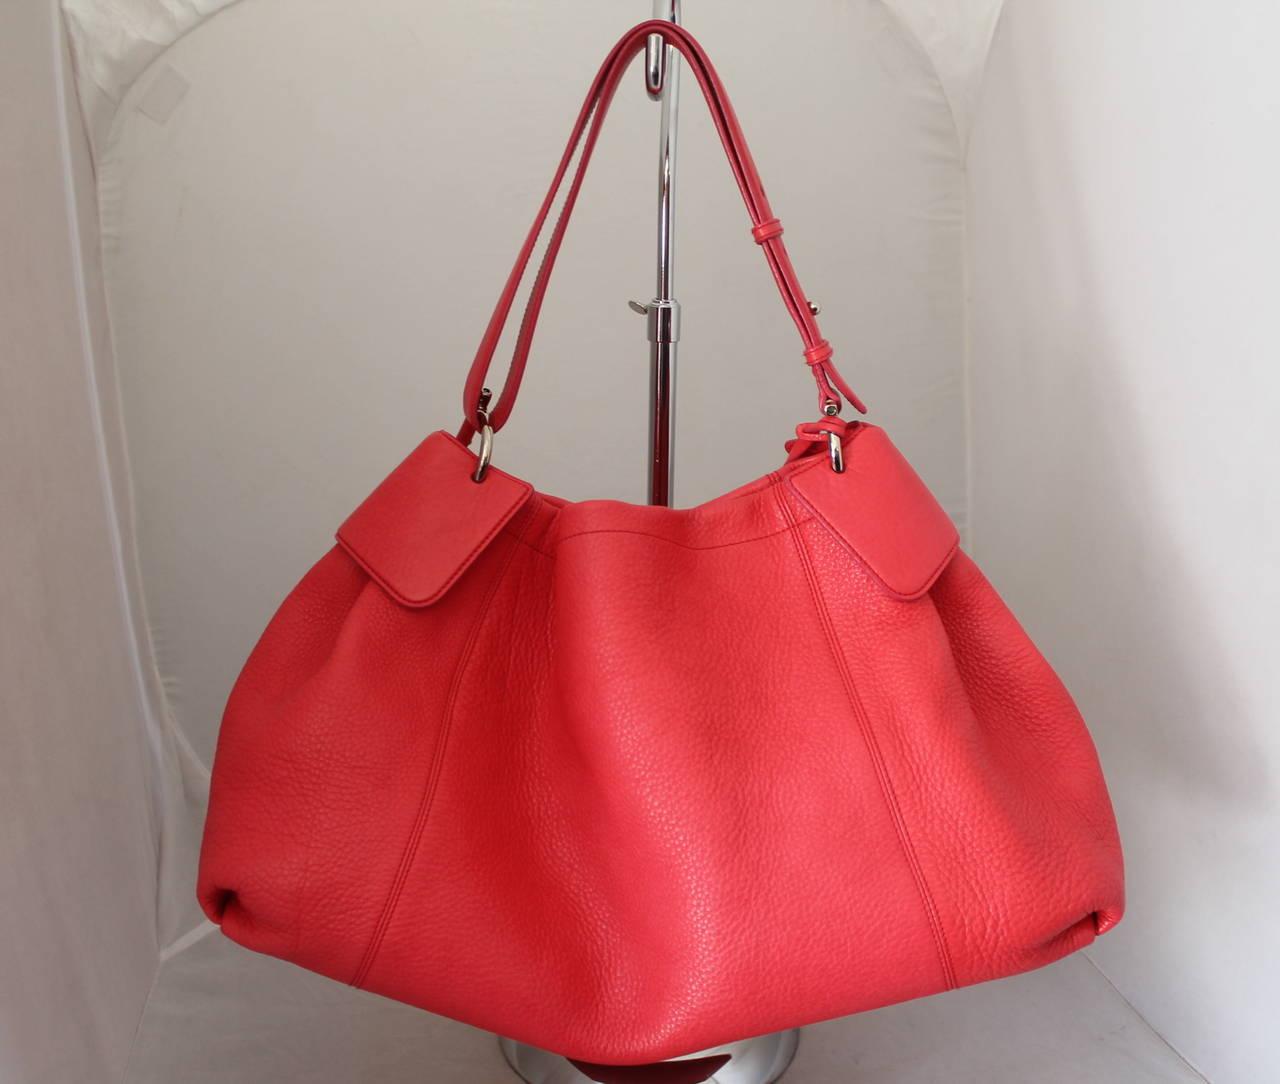 Salvatore Ferragamo Watermelon Pebbled Leather Shoulder Bag 2